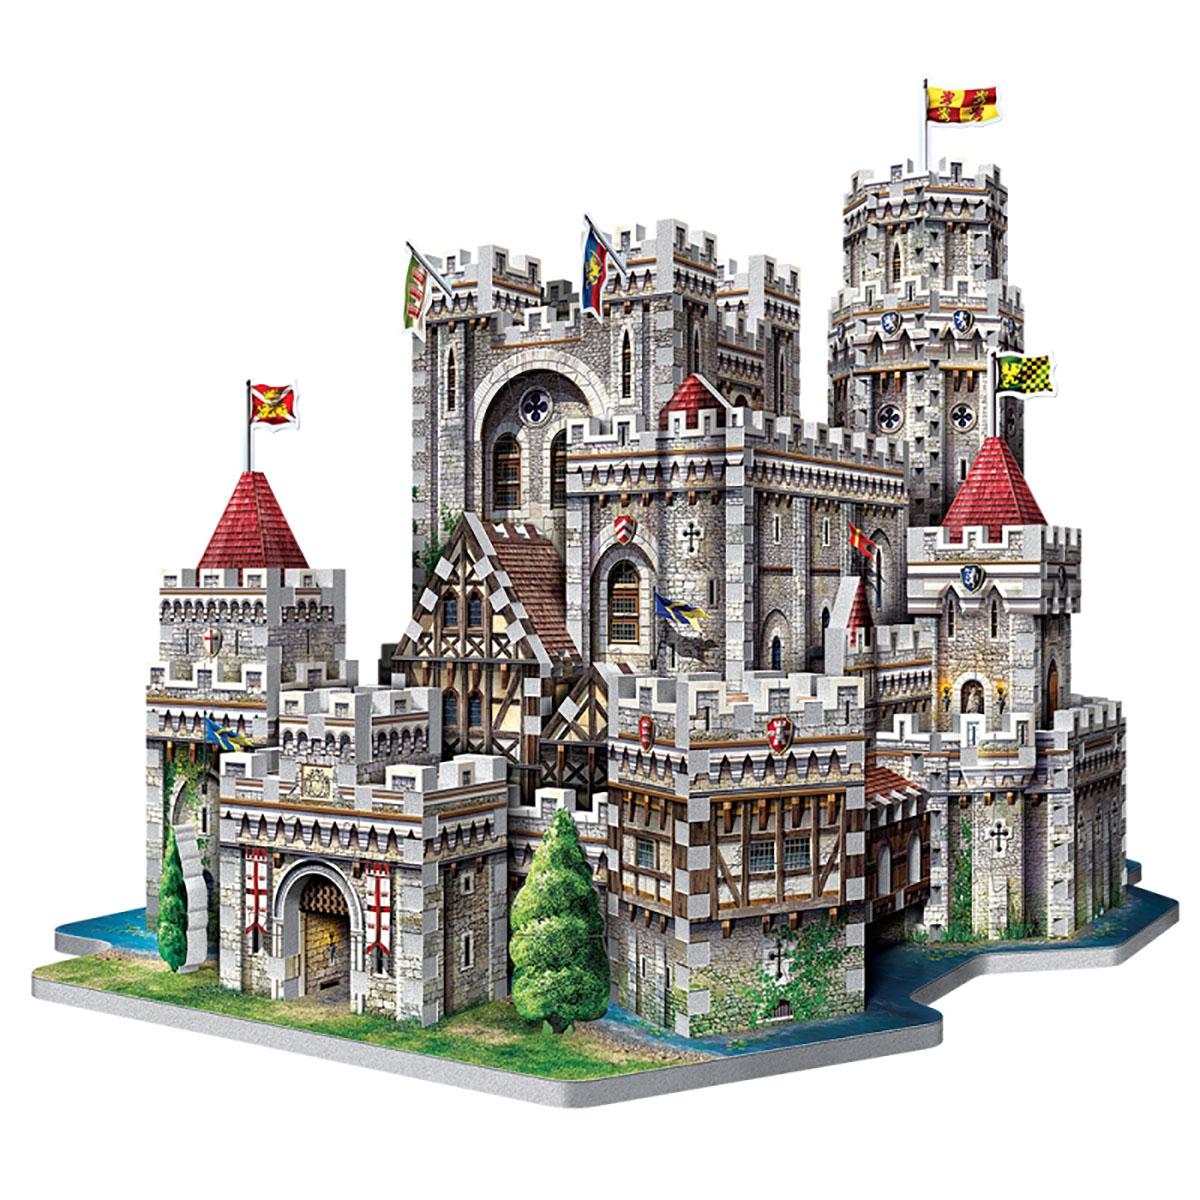 King Arthur's Camelot Fantasy Jigsaw Puzzle